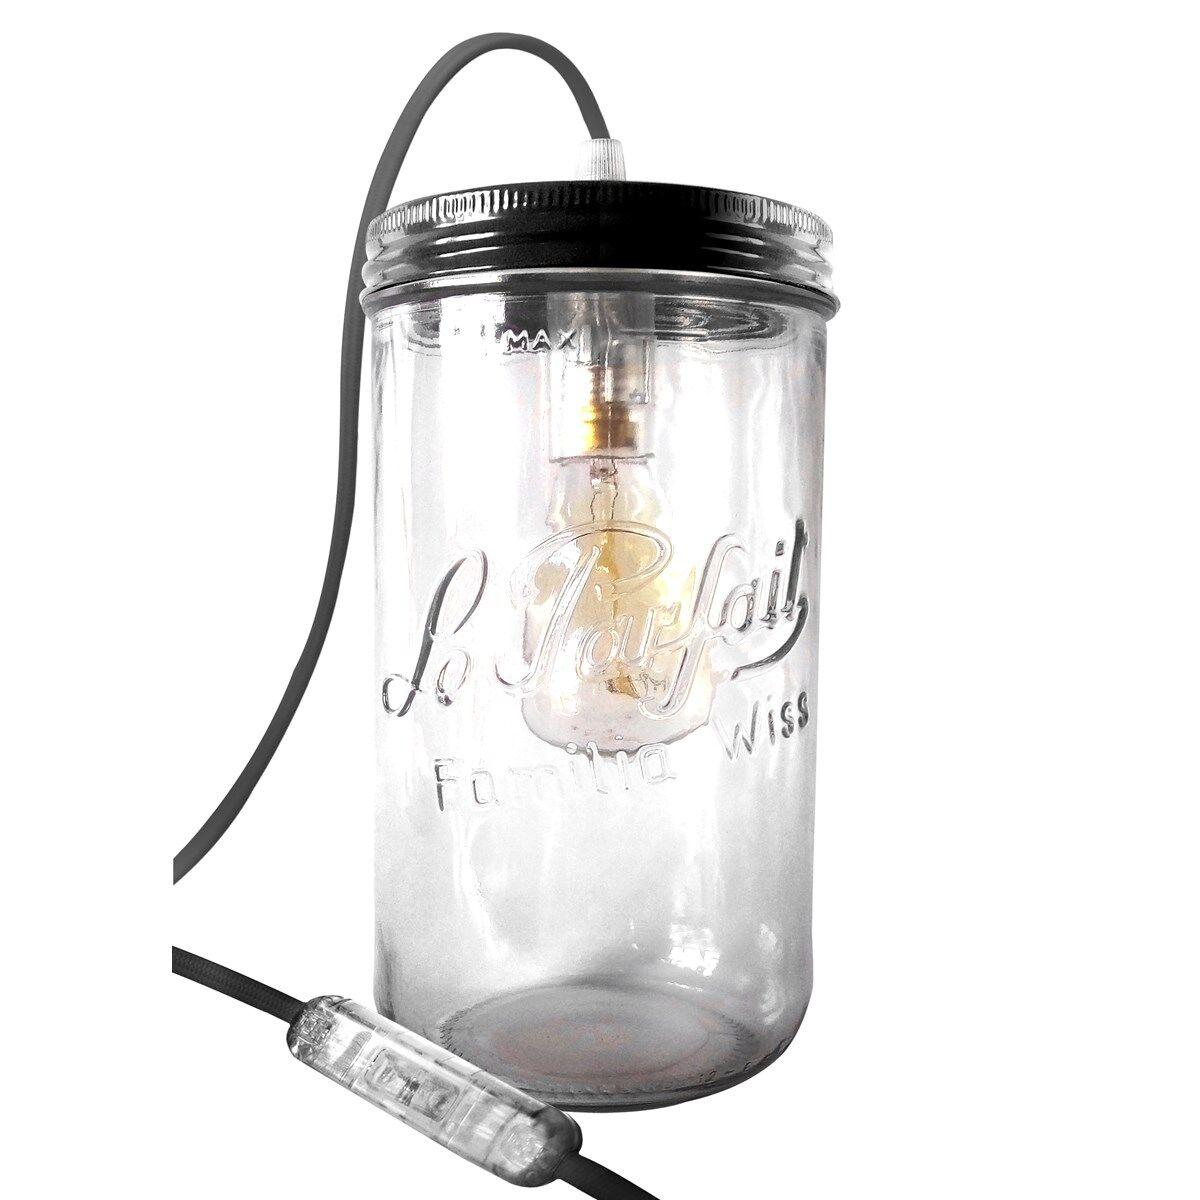 Fenel & Arno Lampe bocal XL en verre noir